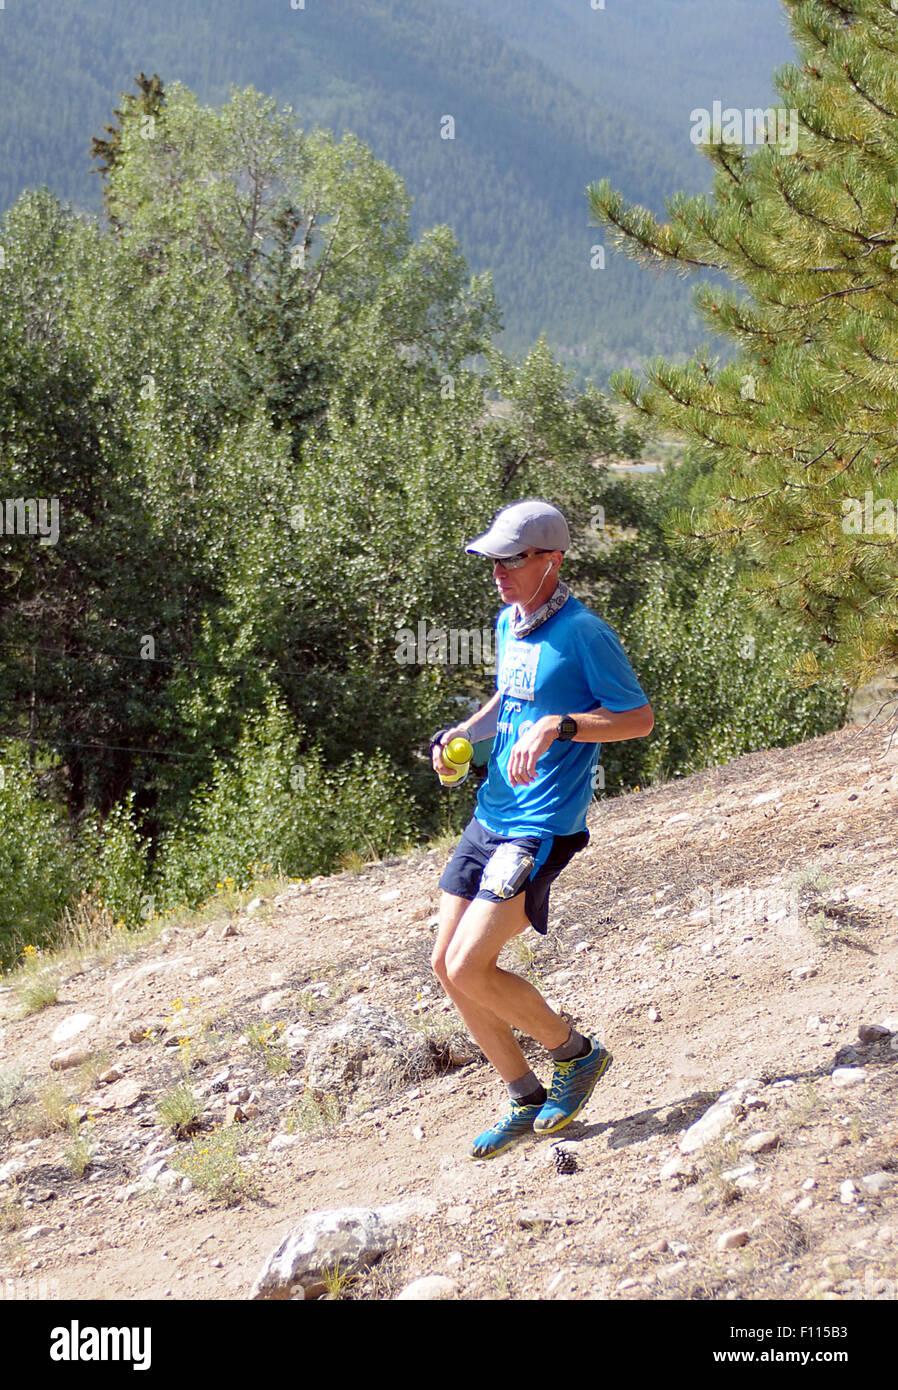 Leadville, Colorado, USA. 22nd Aug, 2015. Colorado runner, Jeason Murphy, negotiates a tricky downhill section near - Stock Image